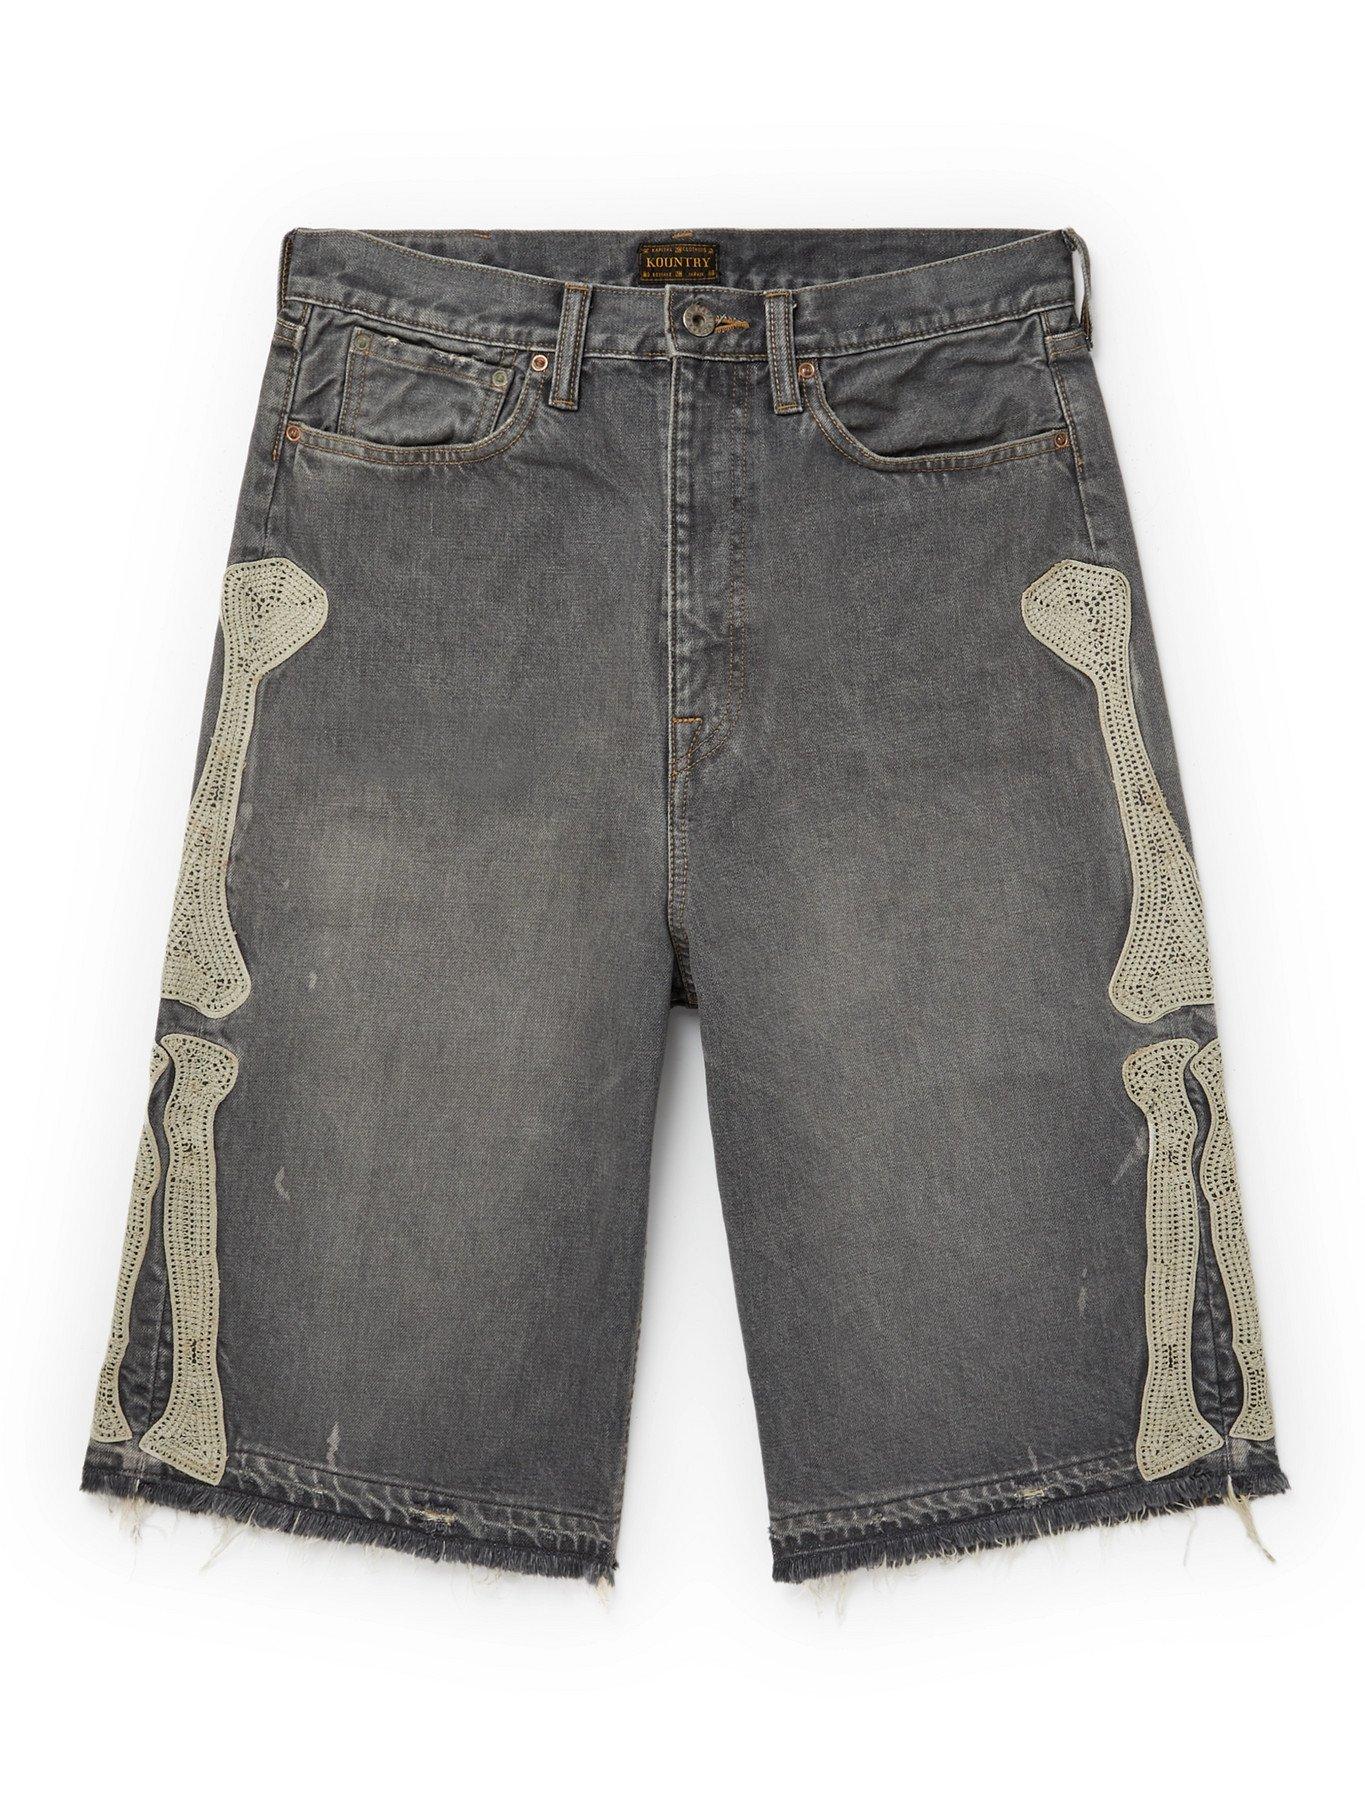 KAPITAL - Wide-Leg Distressed Appliquéd Denim Shorts - Black